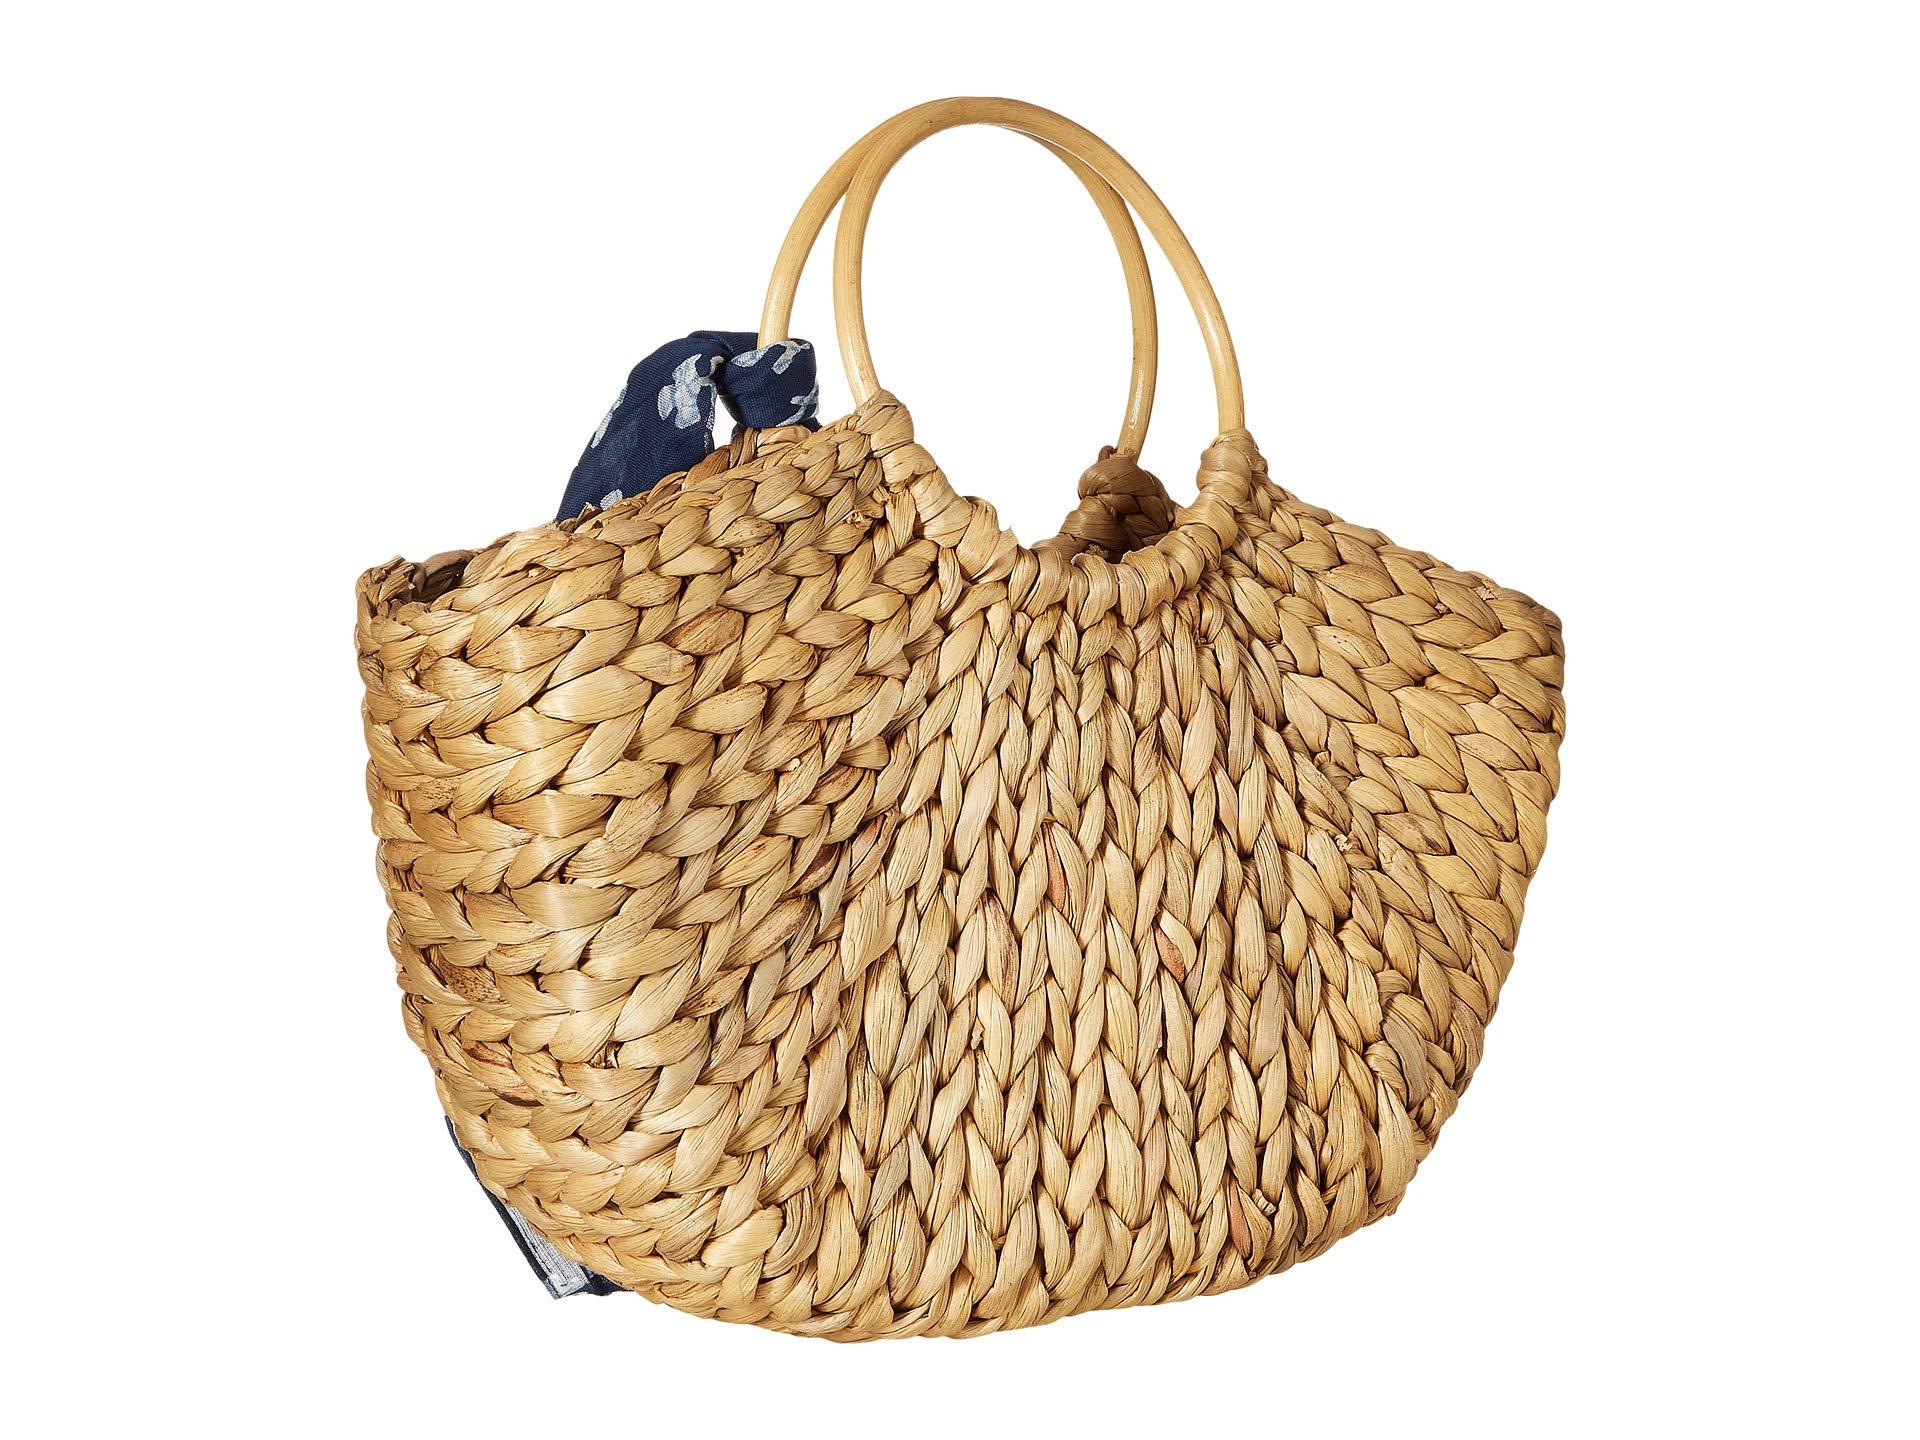 Trim navy Attack Handle Bandana Scarf Block With Print Bag Hat Natural Bangle 0wOBqzz1